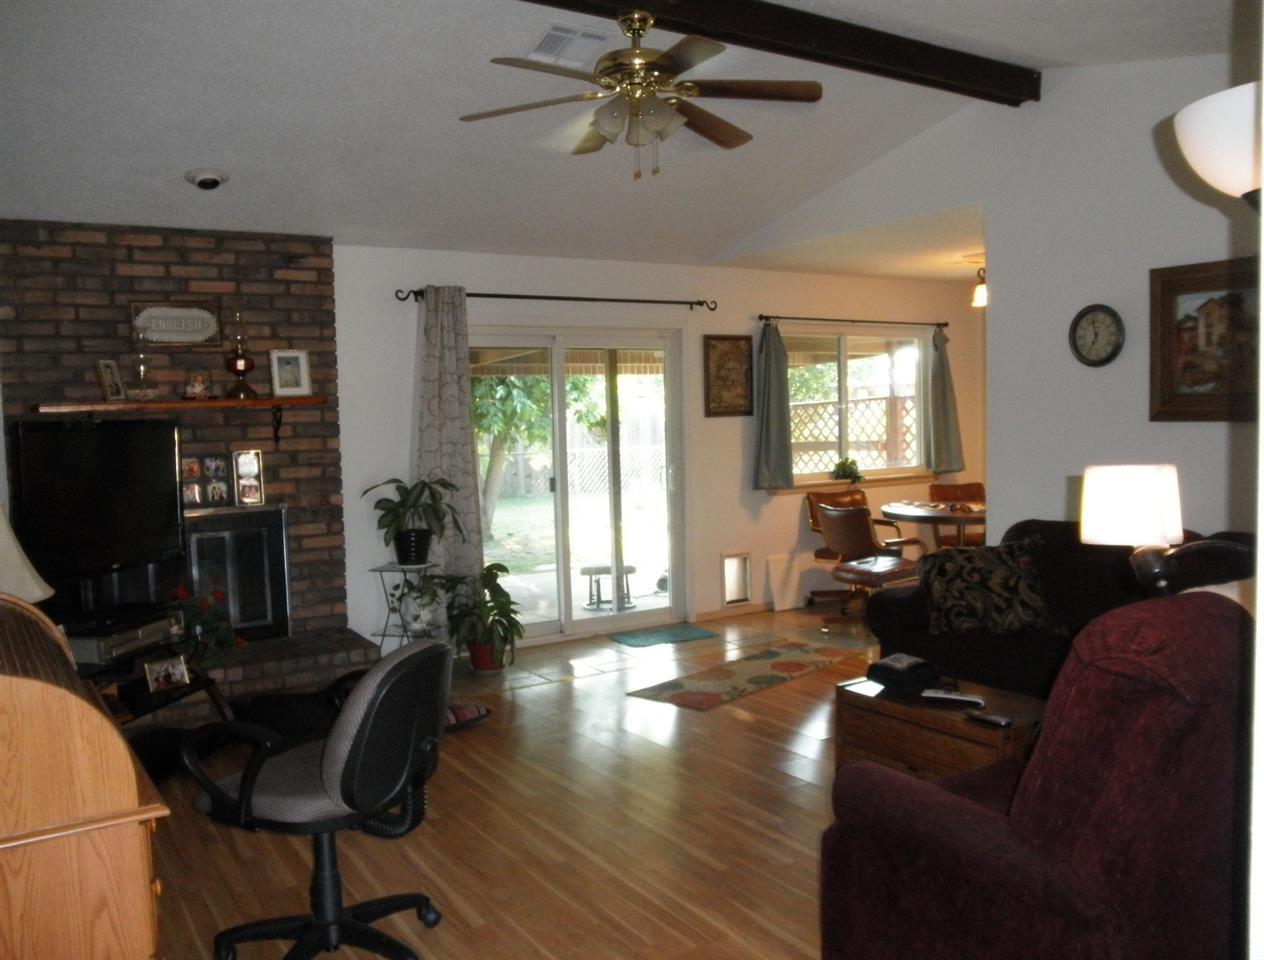 Sold Intraoffice W/MLS | 2520 Bonnie Ponca City, OK 74601 1